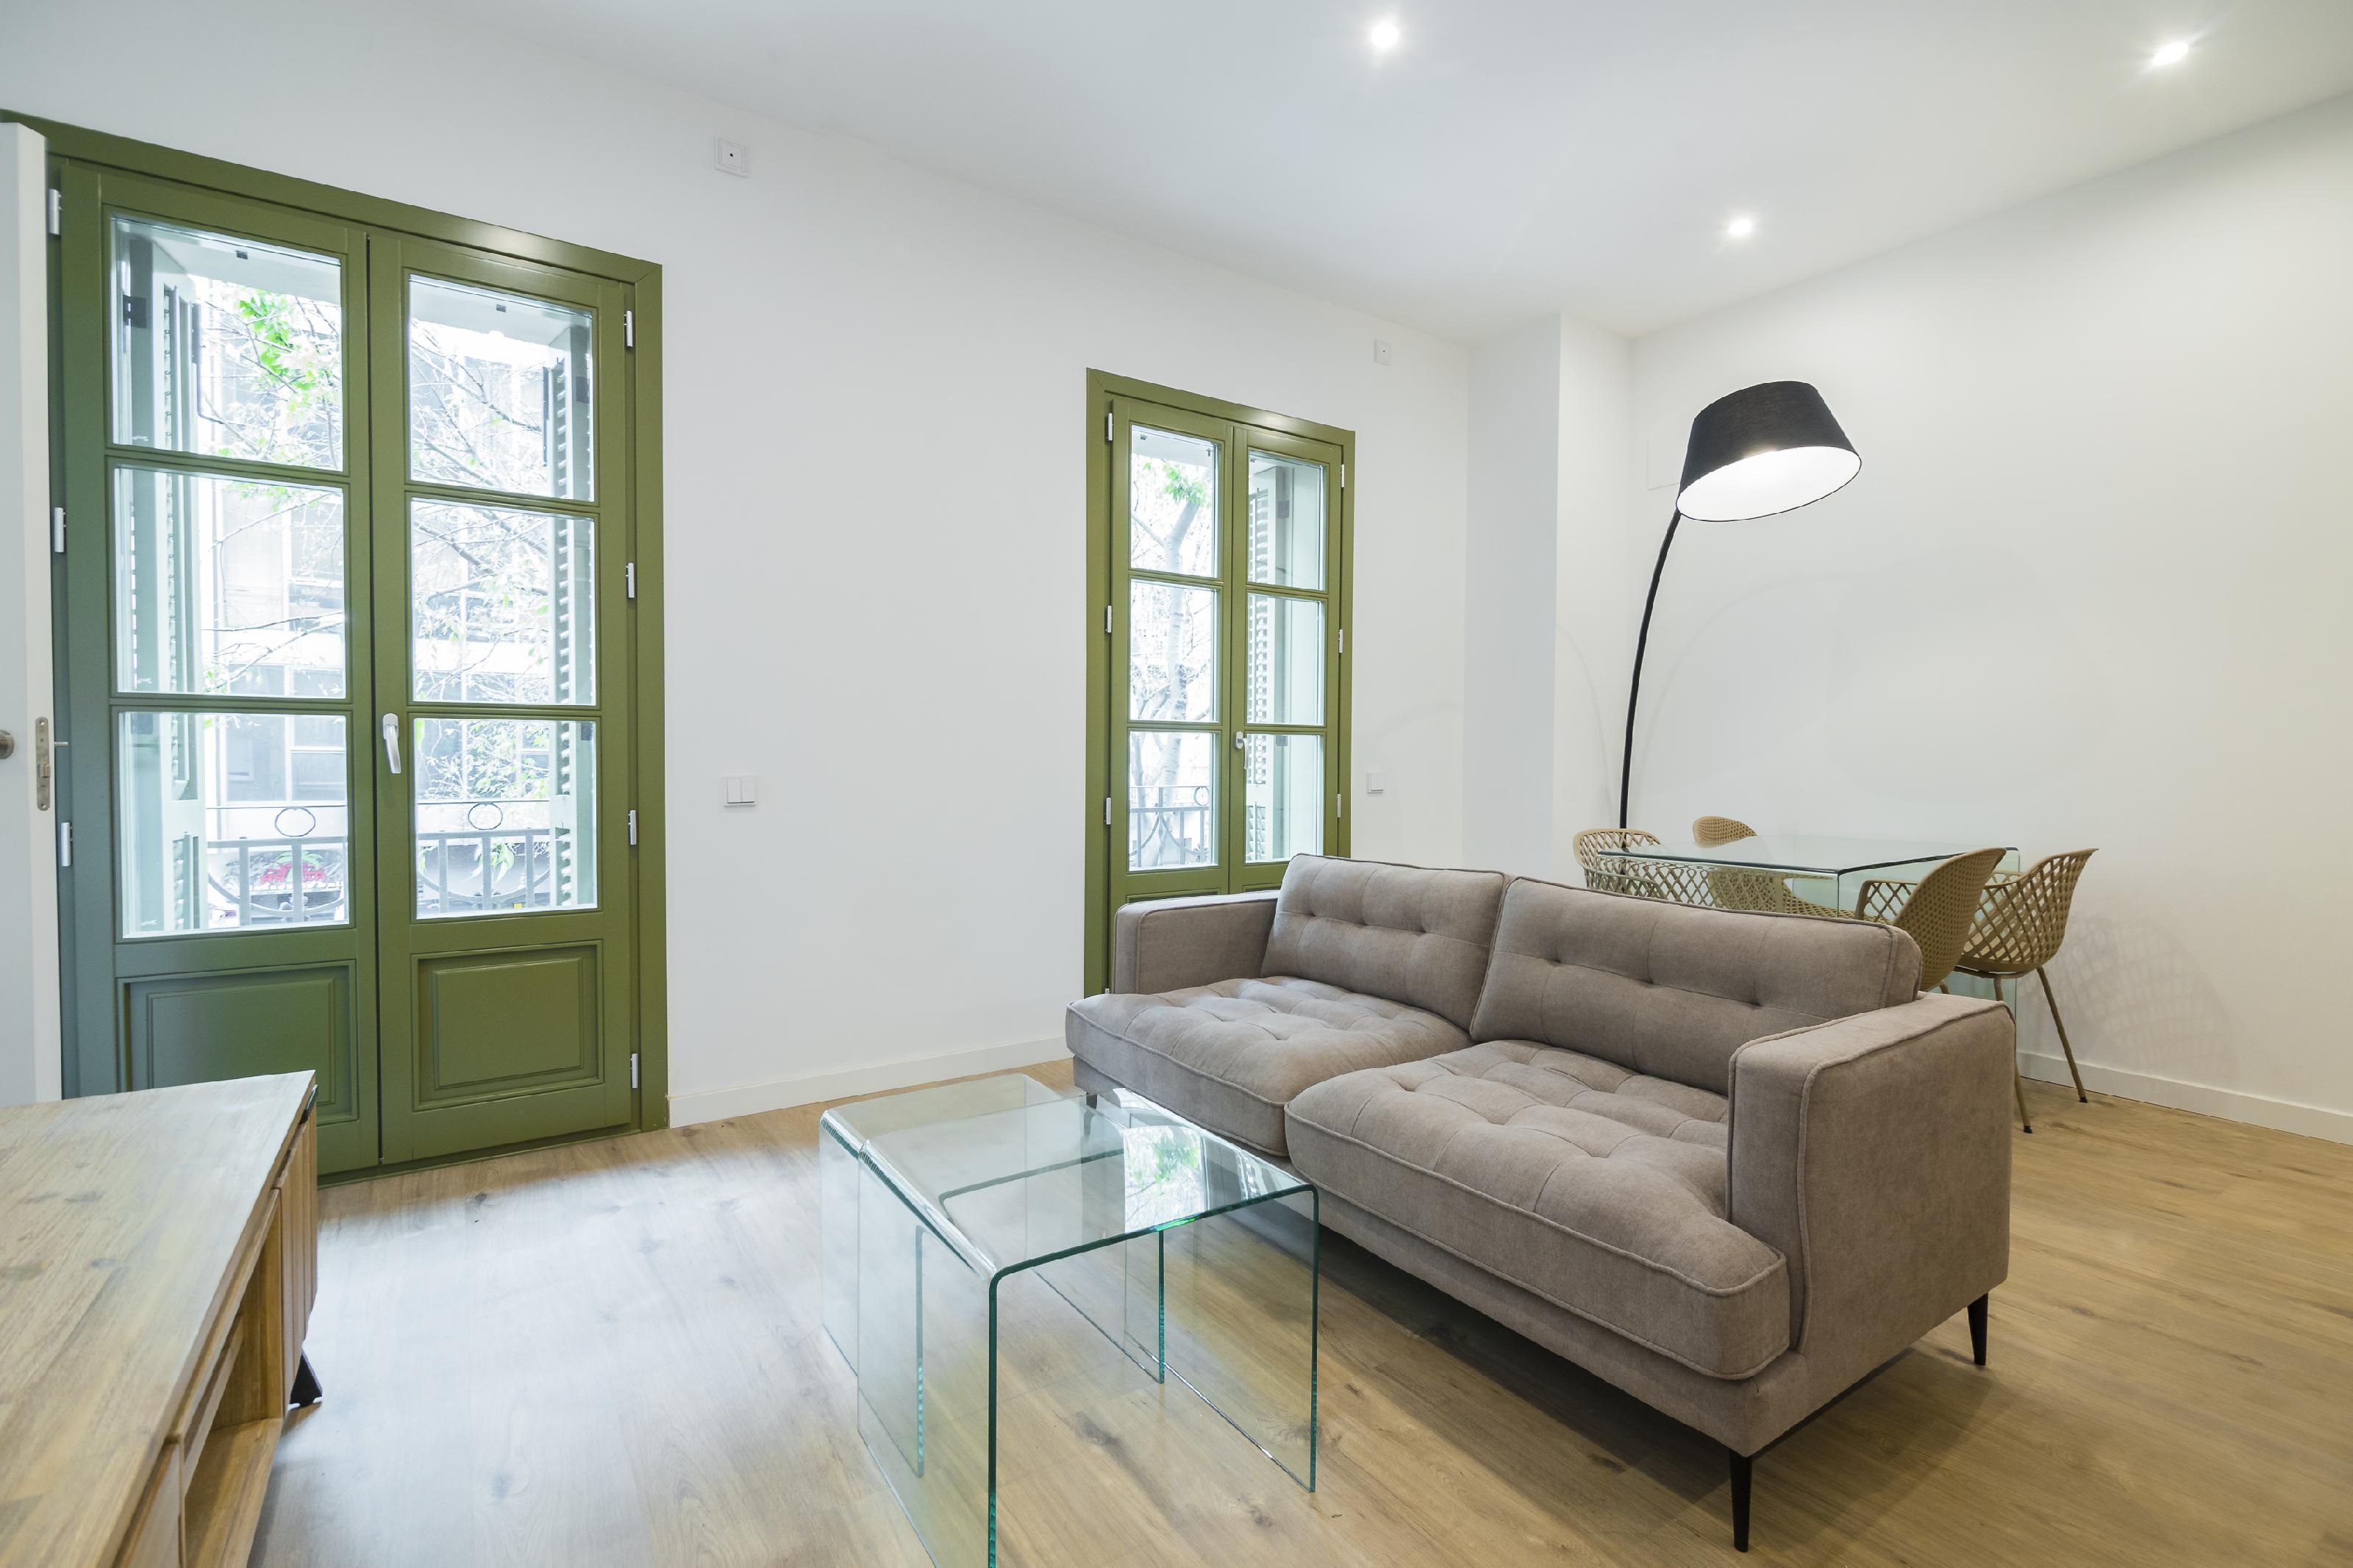 249266 Flat for sale in Eixample, Nova Esquerra Eixample 1